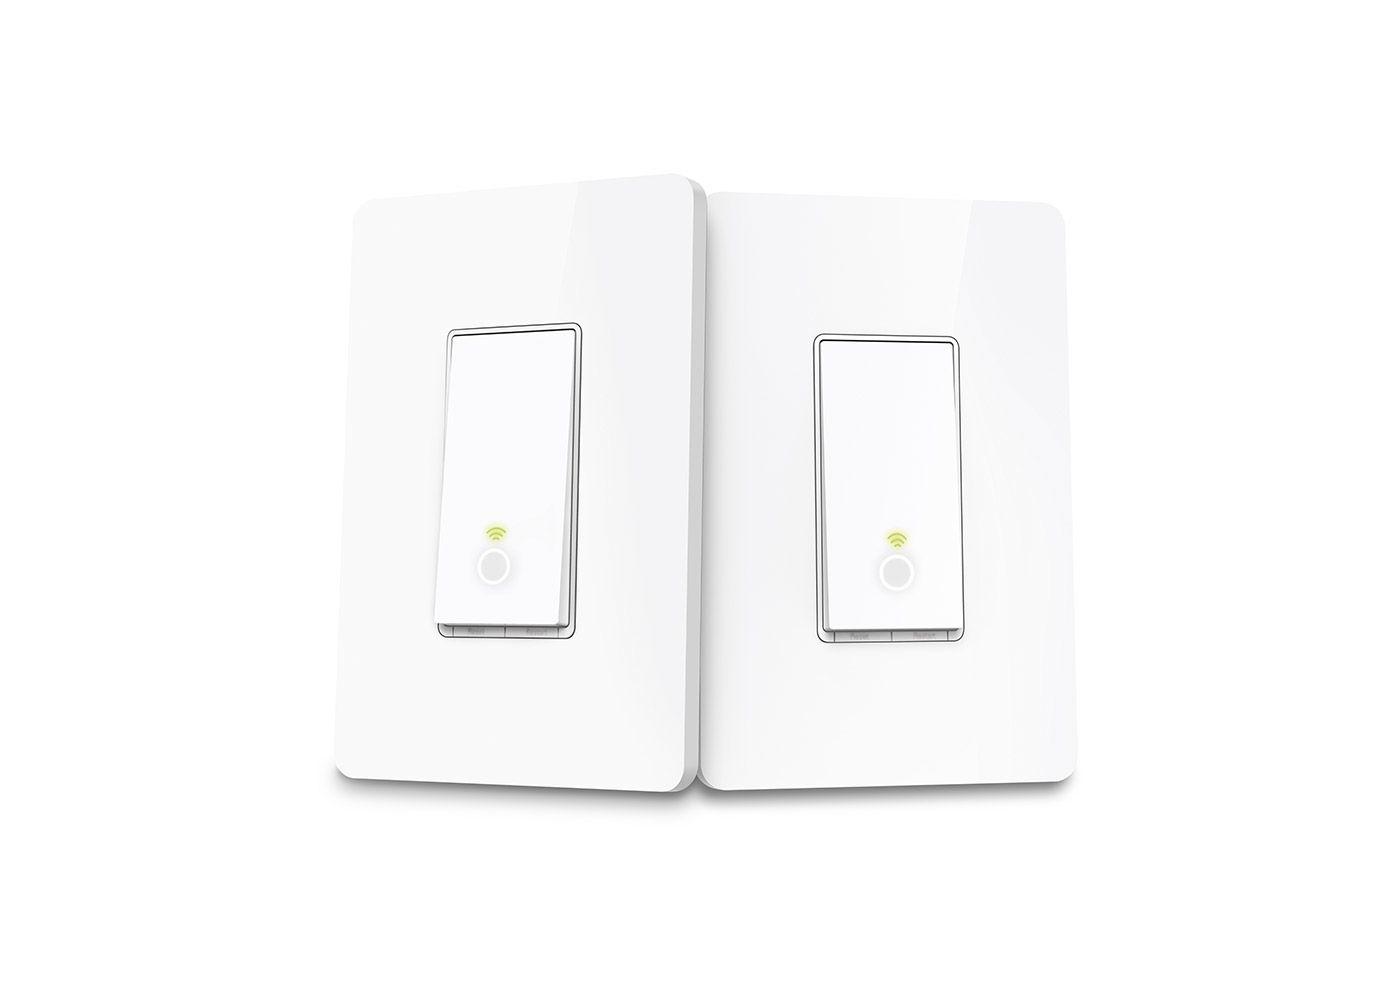 TP Link 3-way Smart Light Switch, 2-pack, HS210 $41.24 @ Target